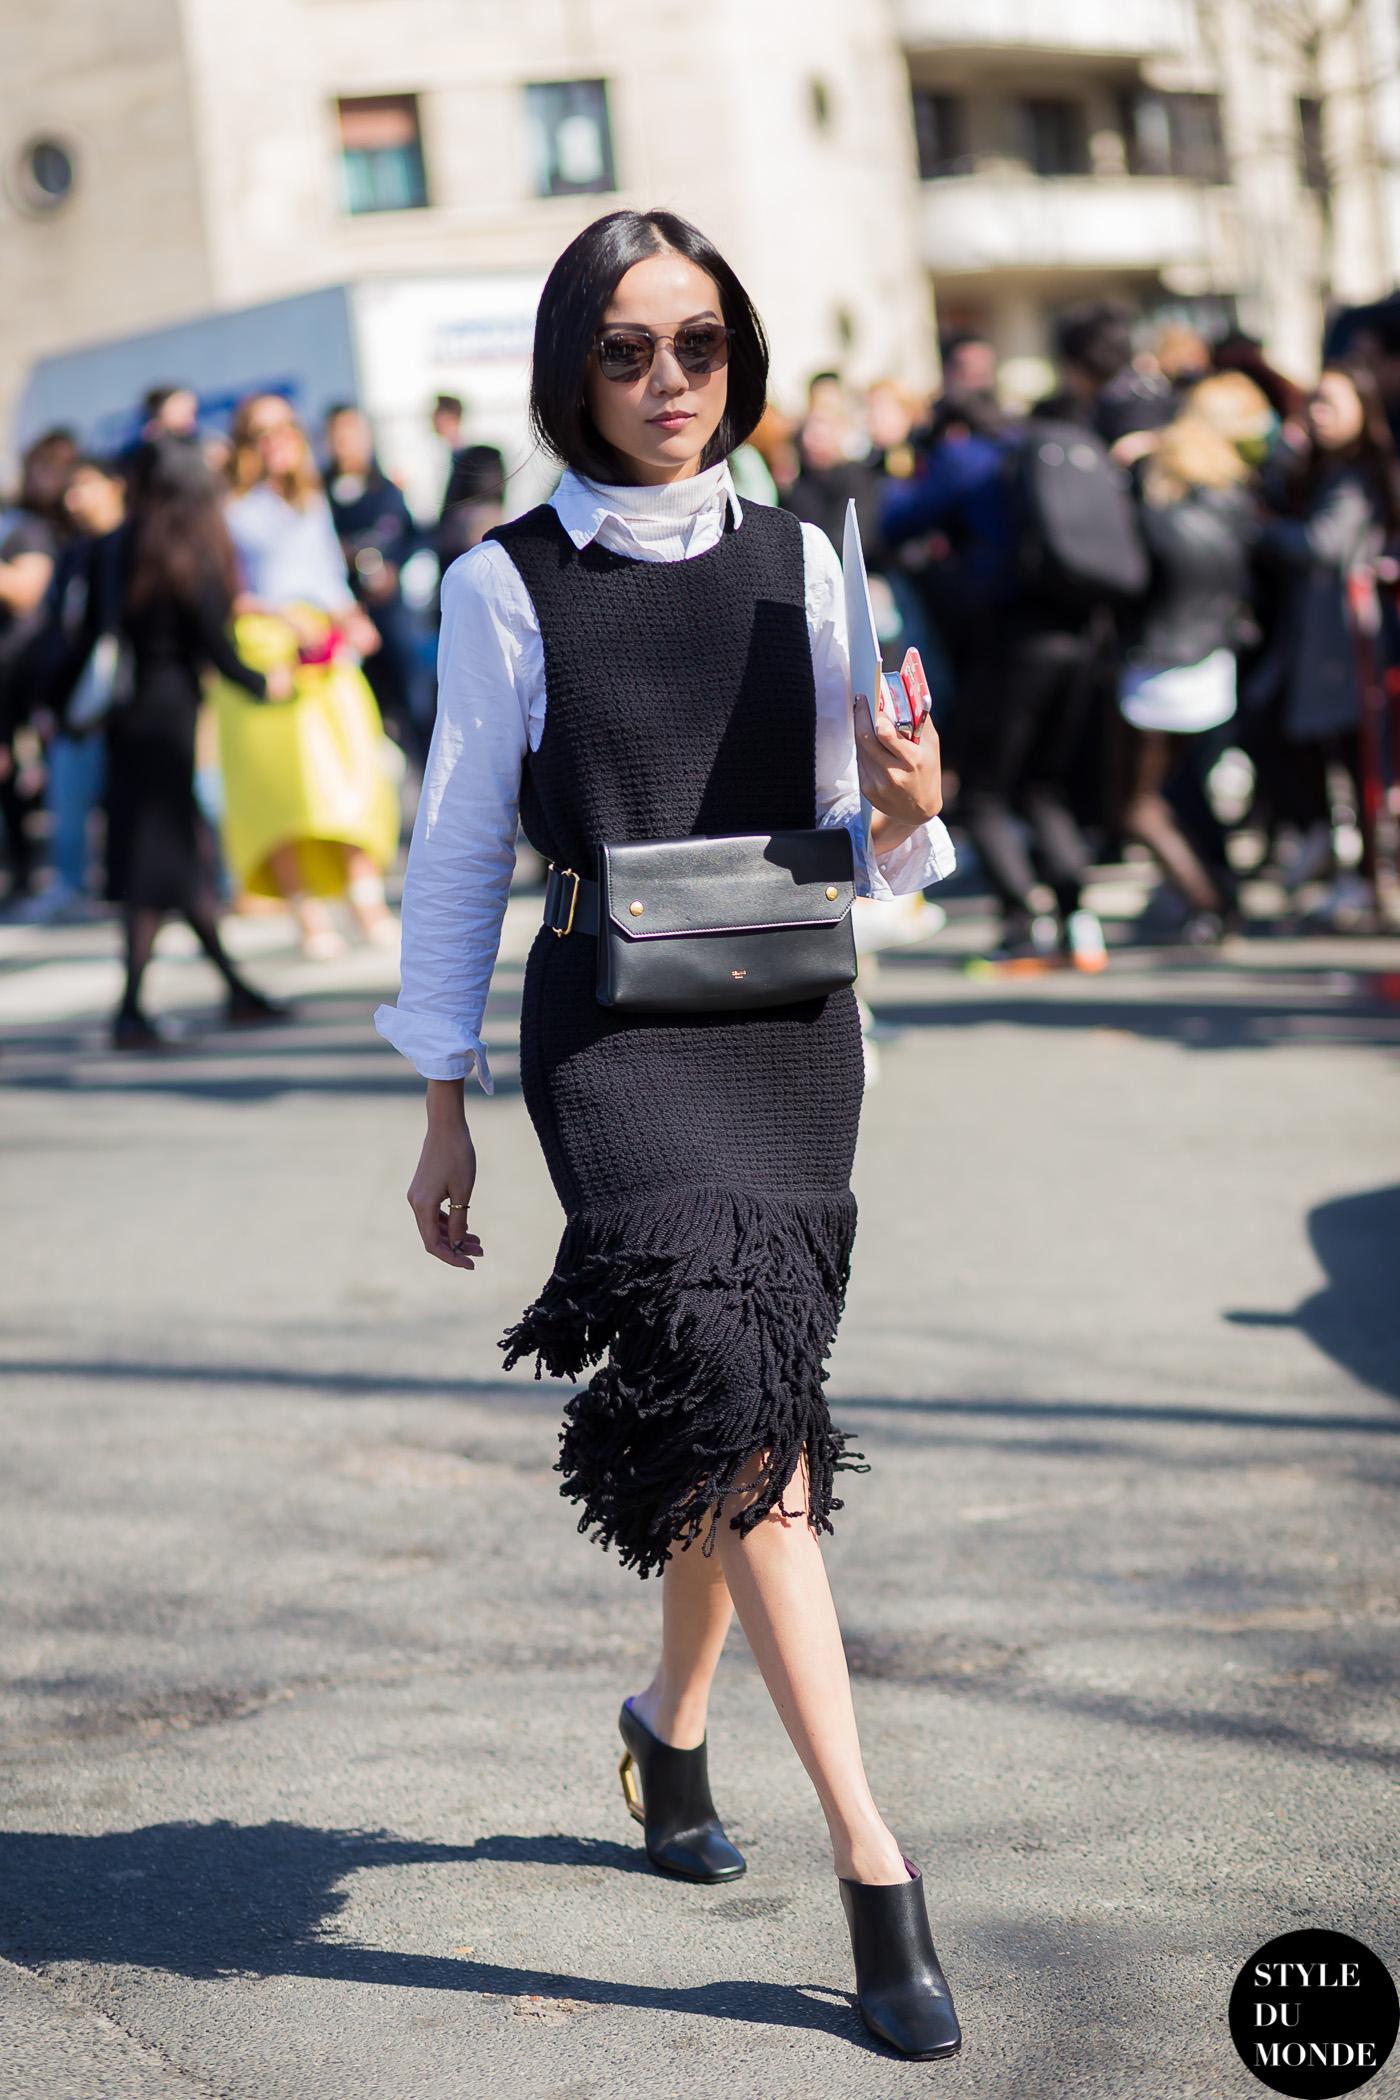 Paris Fashion Week Fw 2015 Street Style Yoyo Cao Style Du Monde Street Style Street Fashion